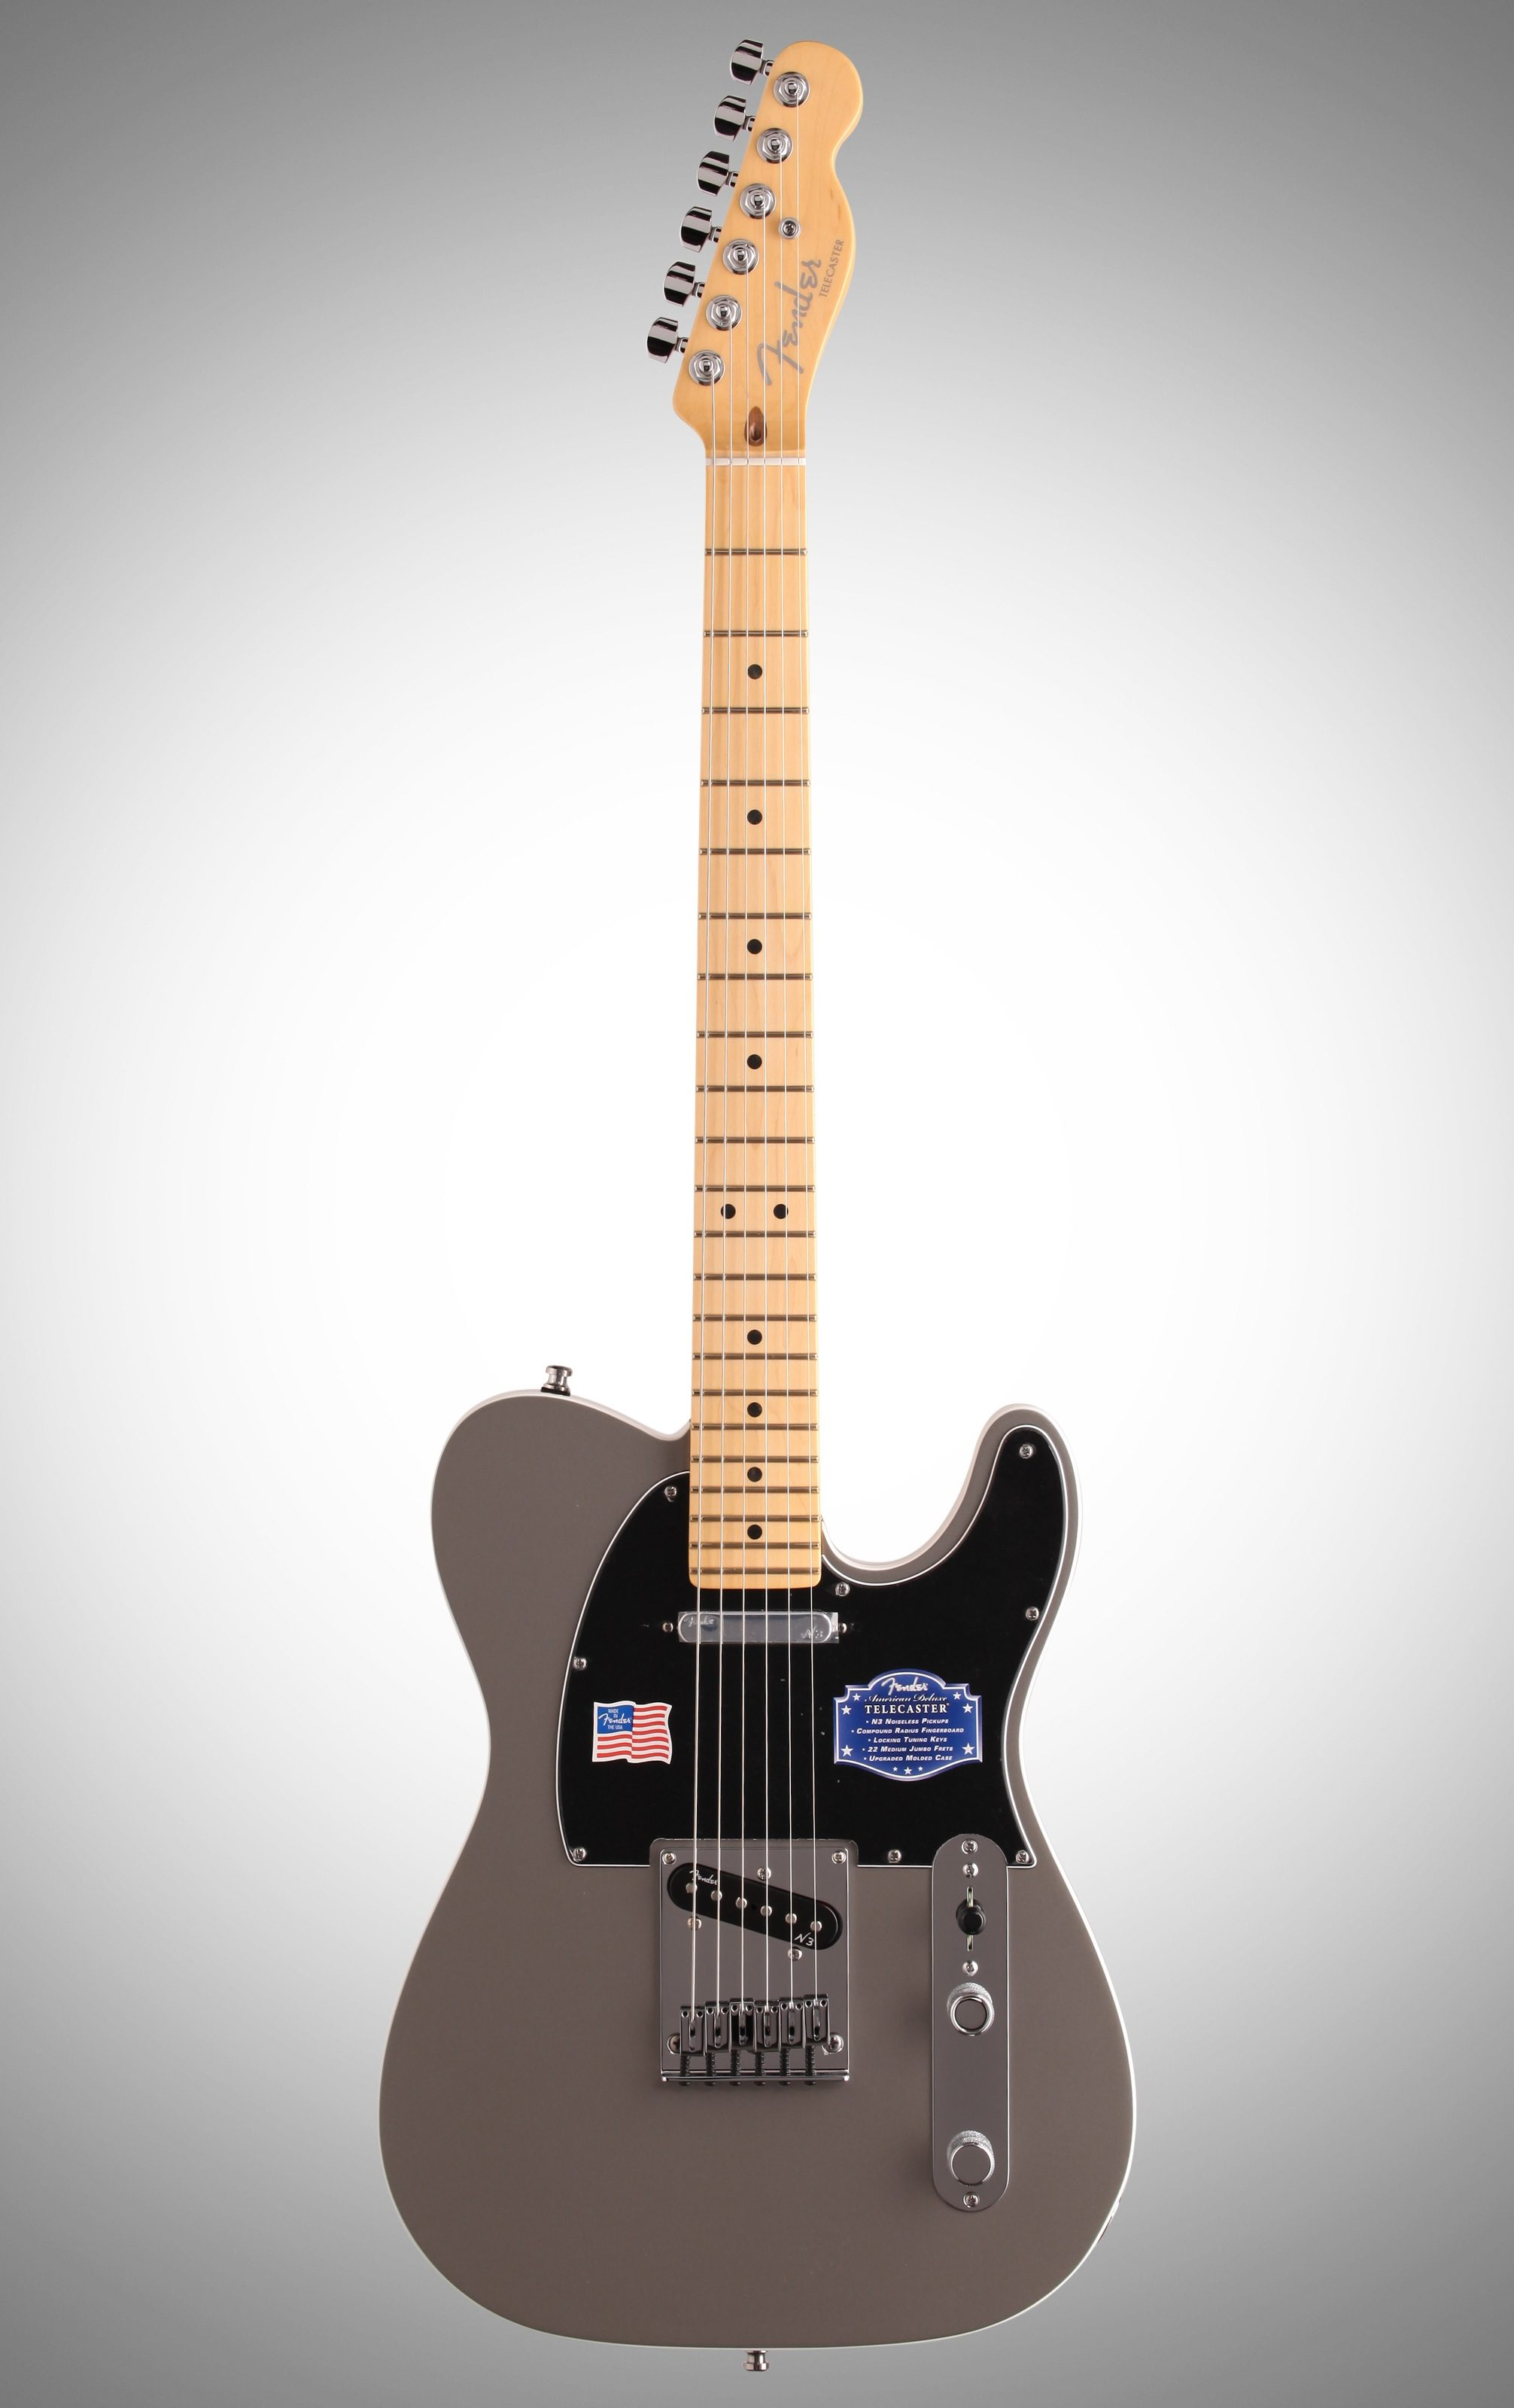 [NRIO_4796]   YF_6719] Fender S1 Switching System Page 3 Download Diagram | Fender American Deluxe Telecaster Wiring Diagram |  | Gray Onom Denli Mohammedshrine Librar Wiring 101